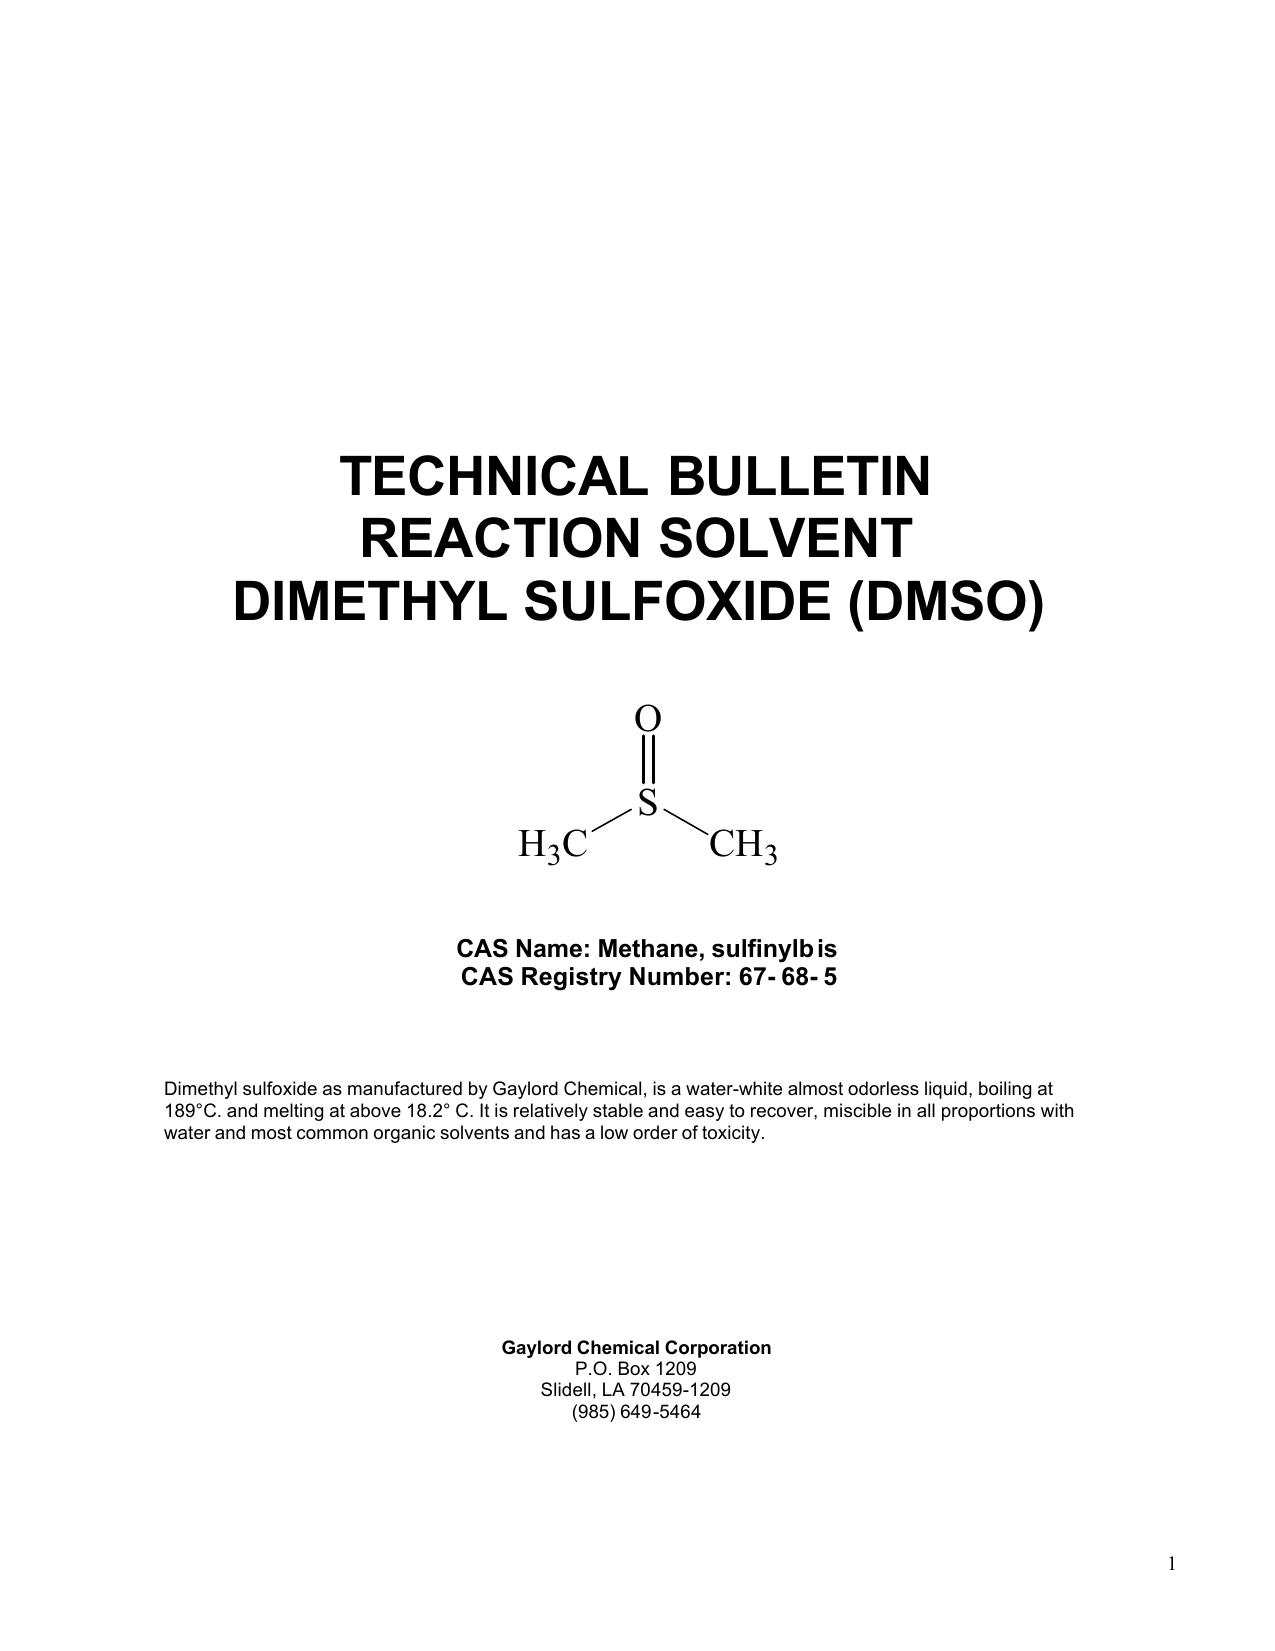 technical bulletin reaction solvent dimethyl sulfoxide (dmso)